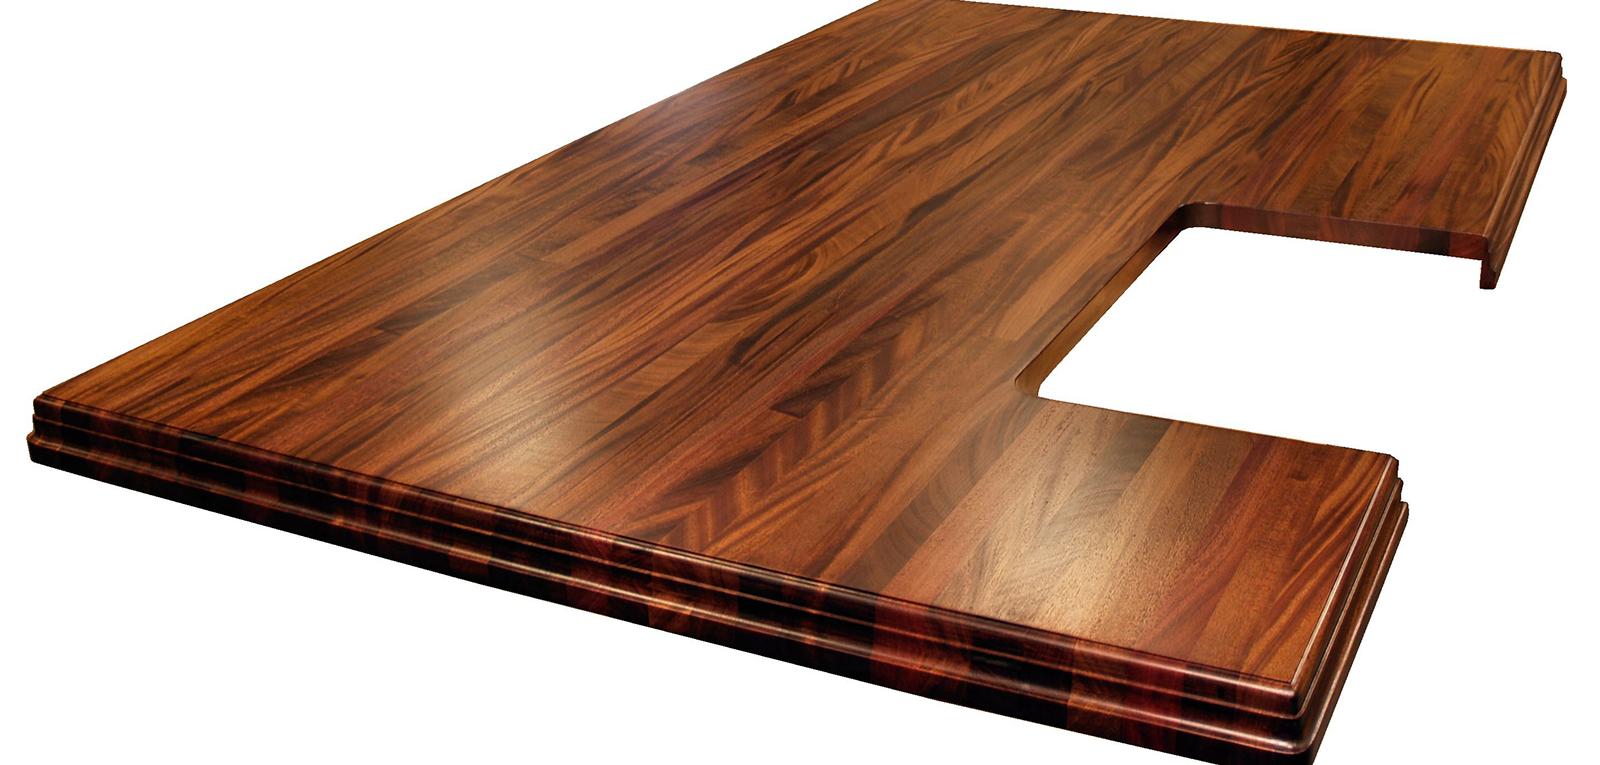 dark mahogany furniture. An Introduction To Wood Species, Part 22: African Mahogany\u0026nbsp; - Core77 Dark Mahogany Furniture G